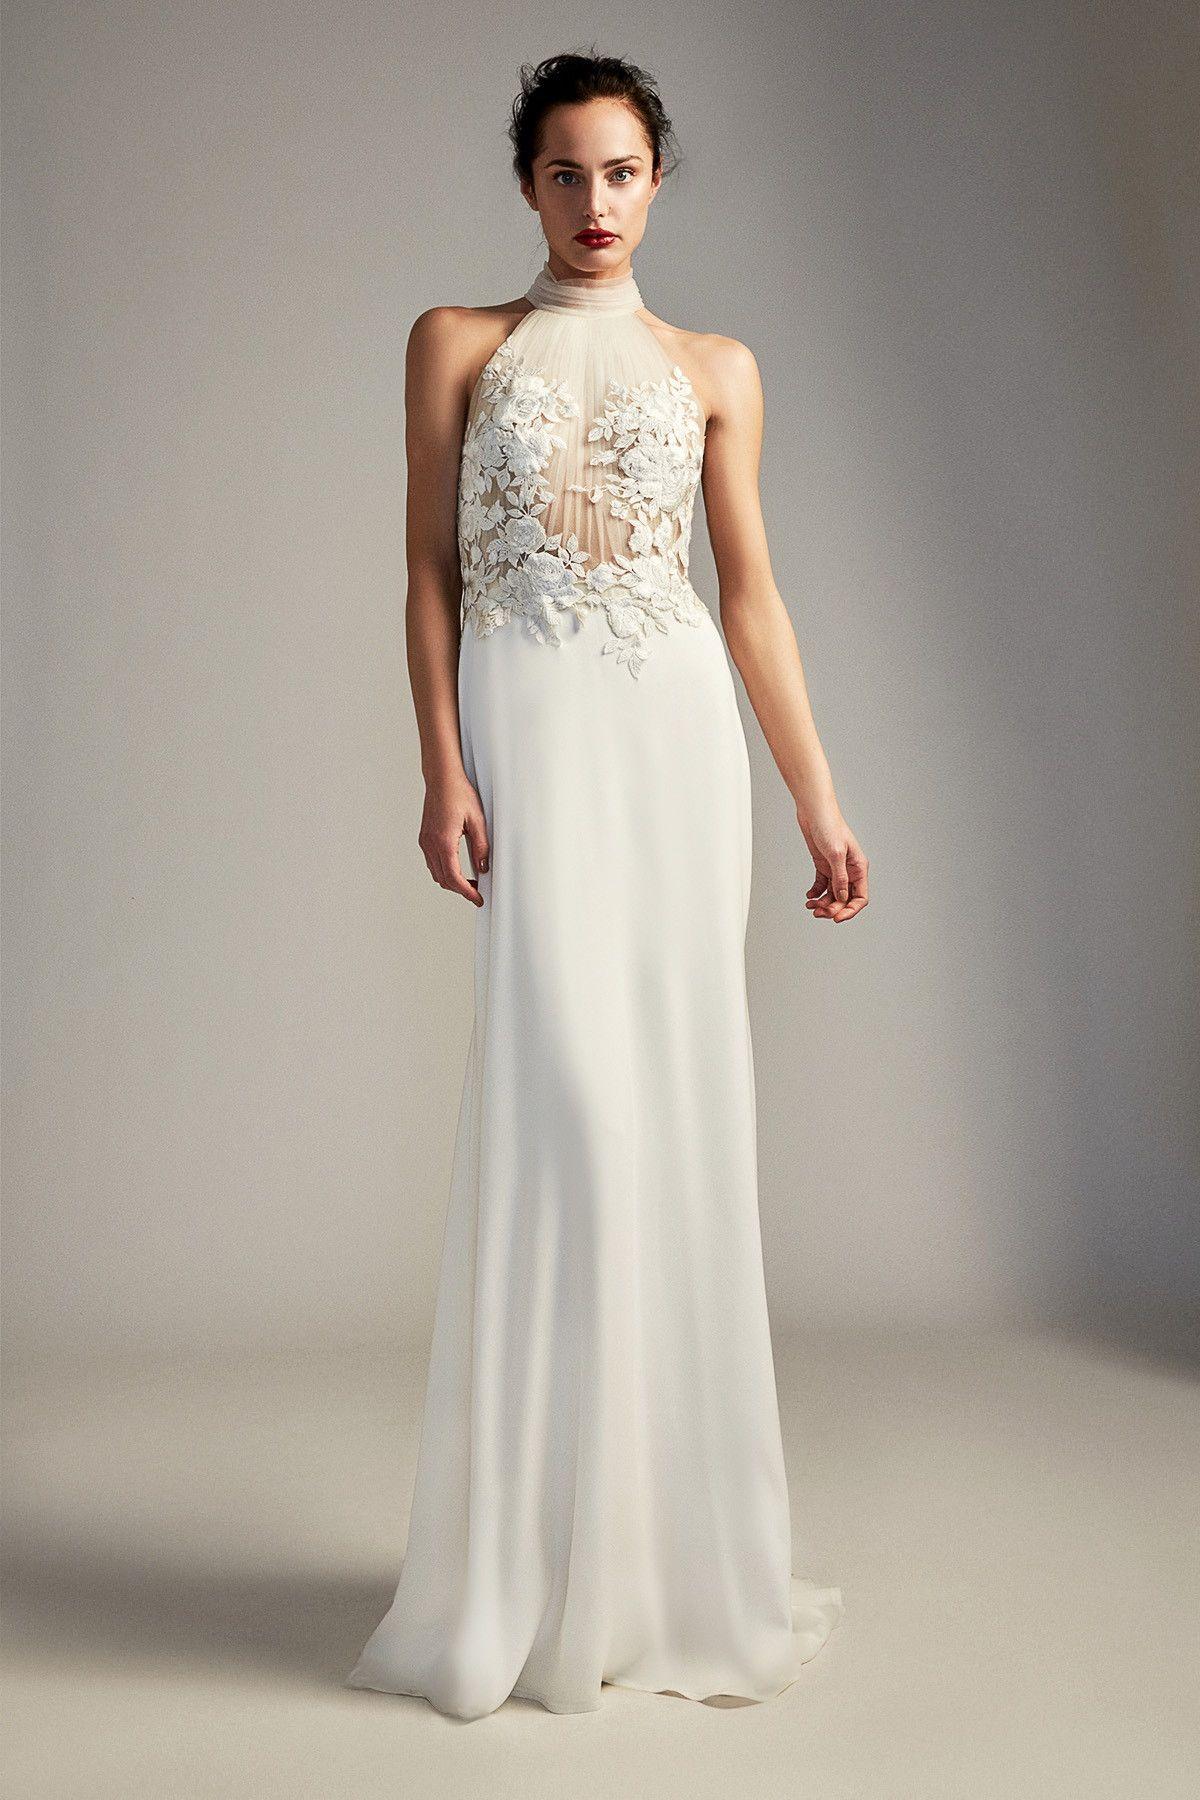 Dianna Gown | Tadashi Shoji | Wedding Dress | Pinterest | Tadashi ...